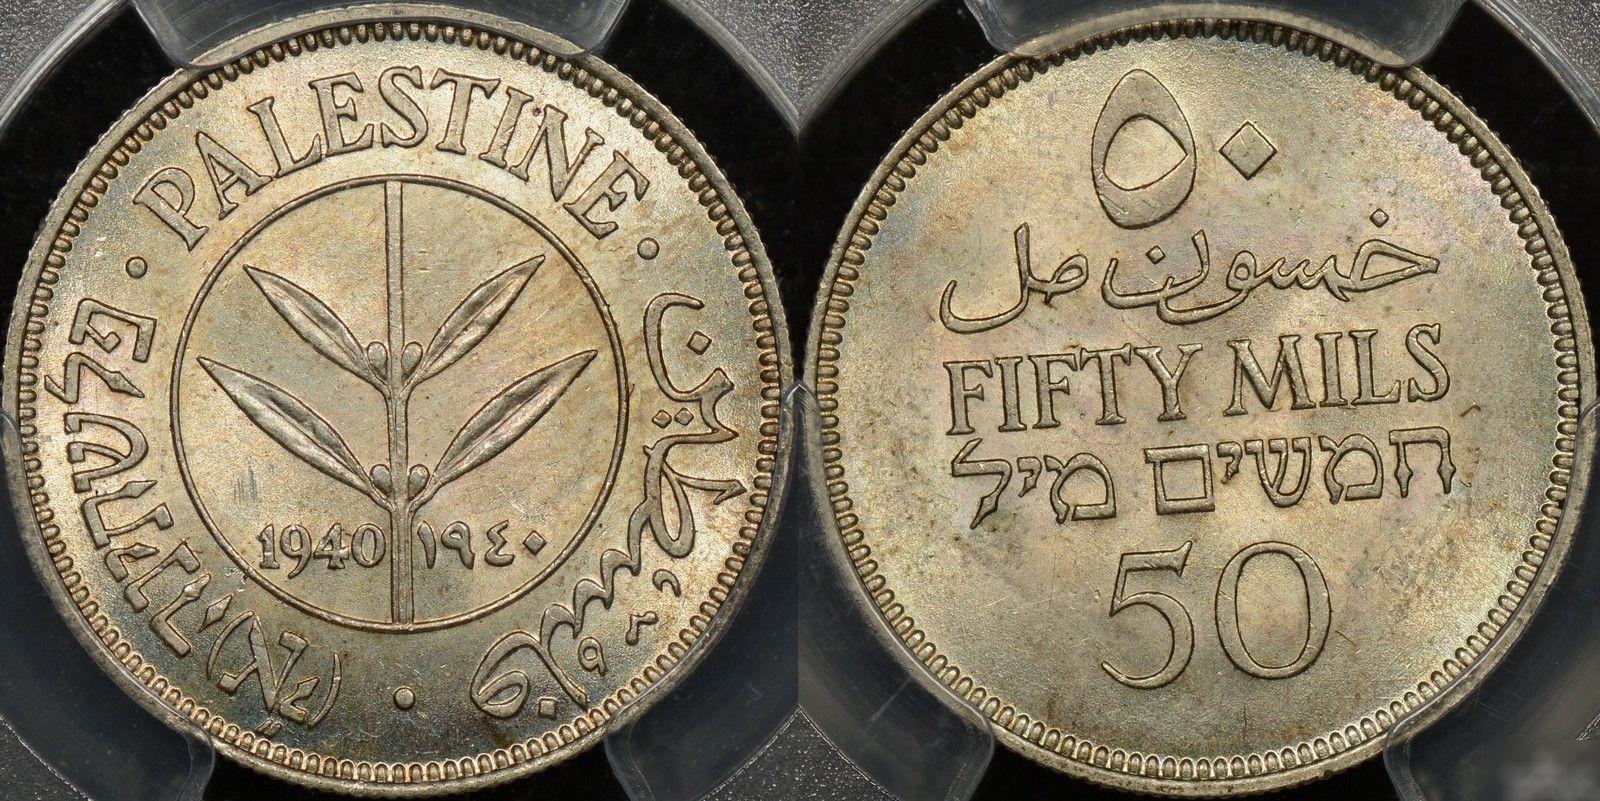 Palestine 1940 50 mils km 6 PCGS MS63 Uncirculated